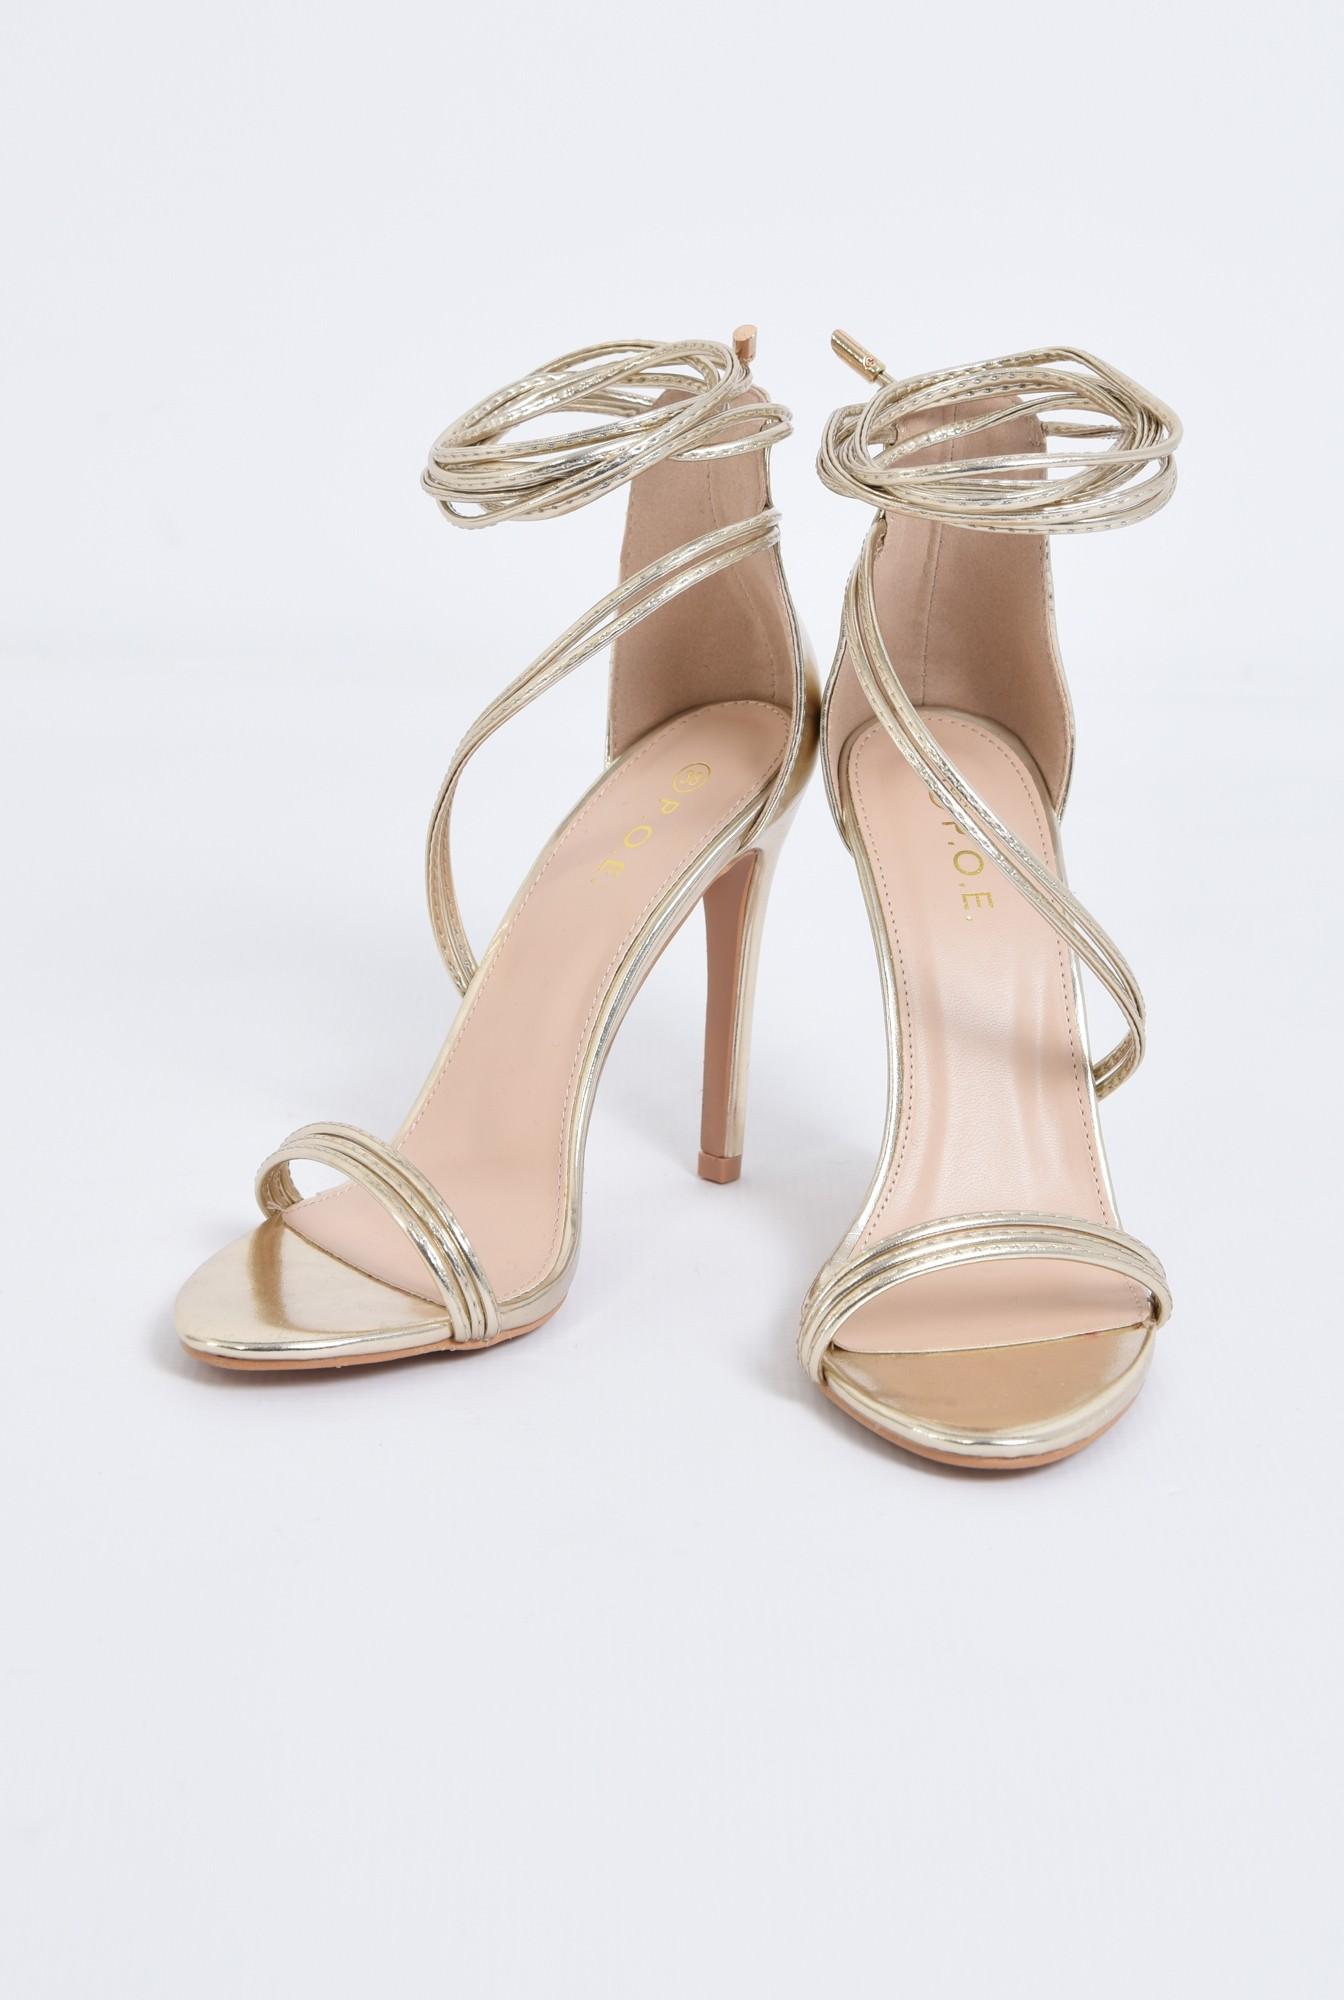 3 - sandale de seara, auriu, metalizat, barete